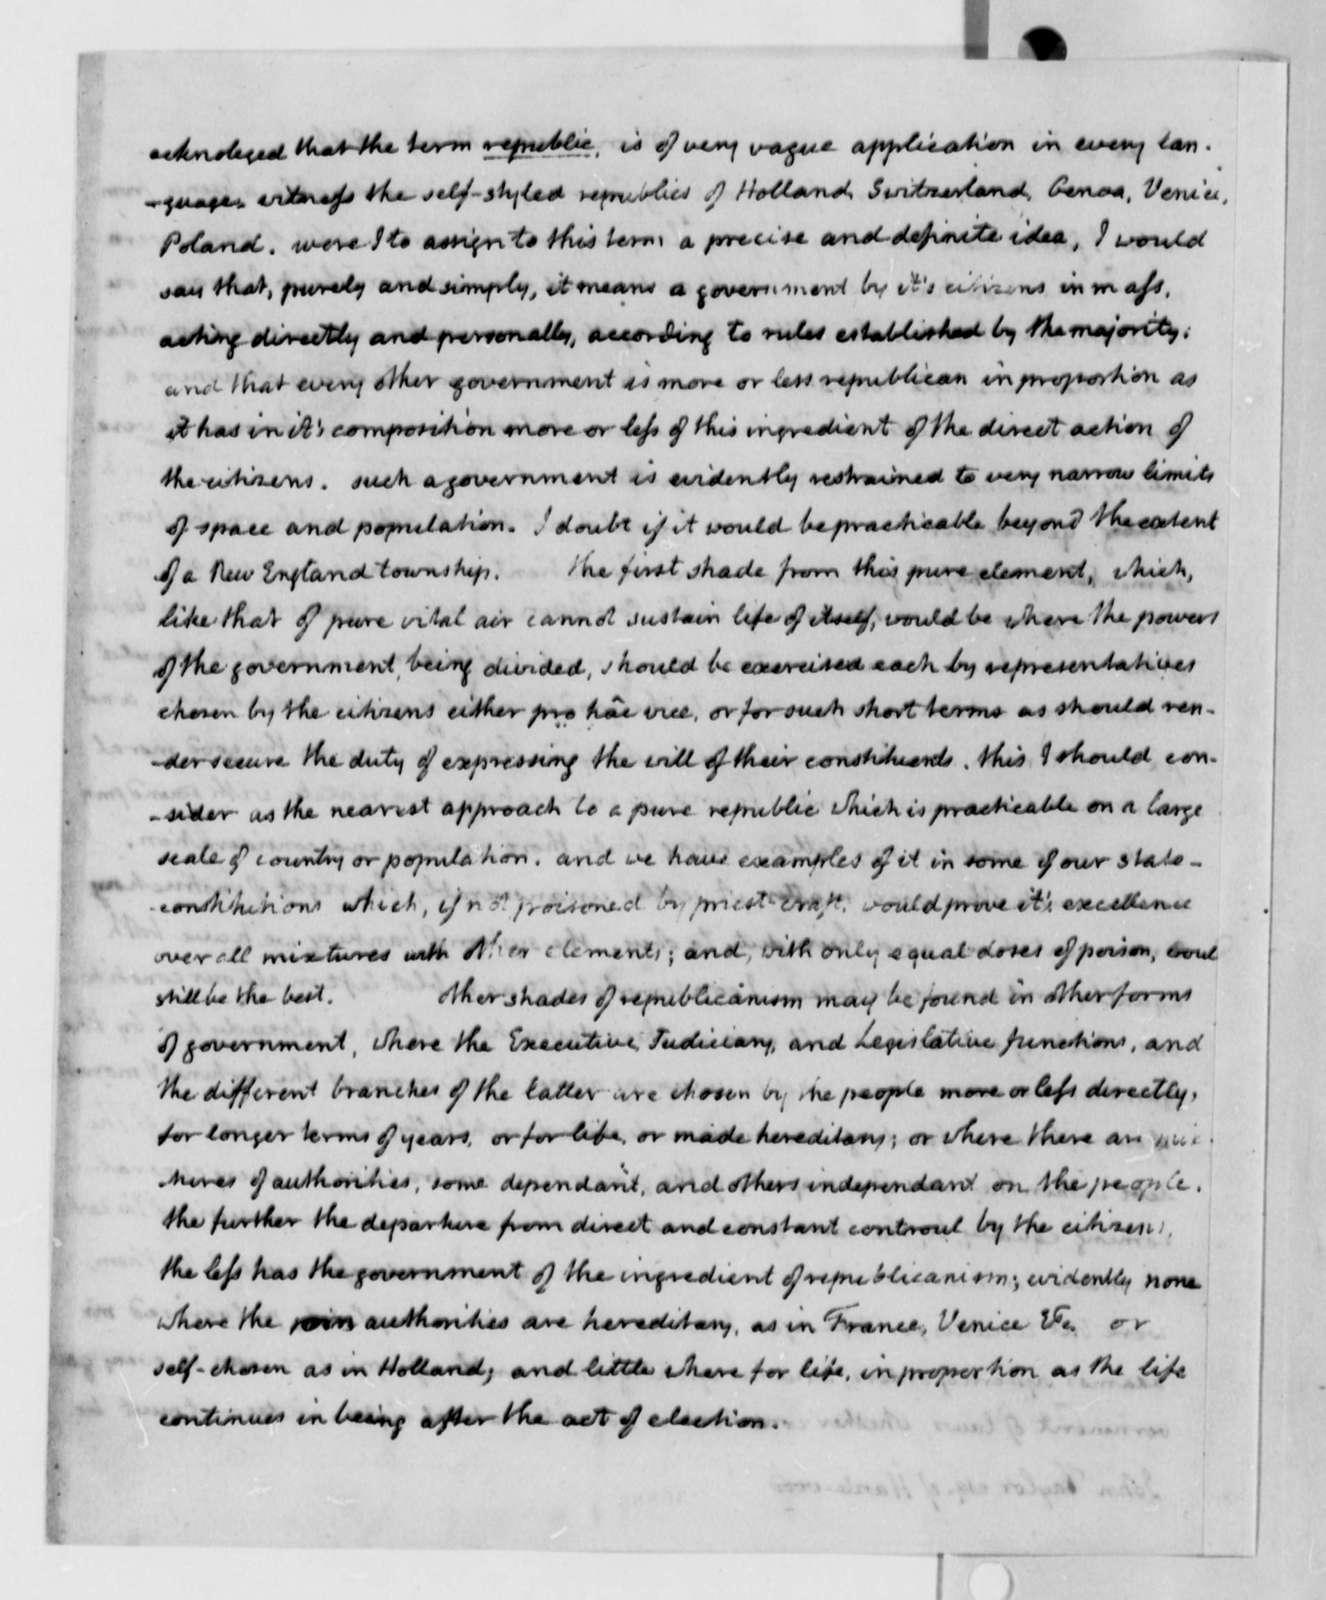 Thomas Jefferson to John Taylor, May 28, 1816